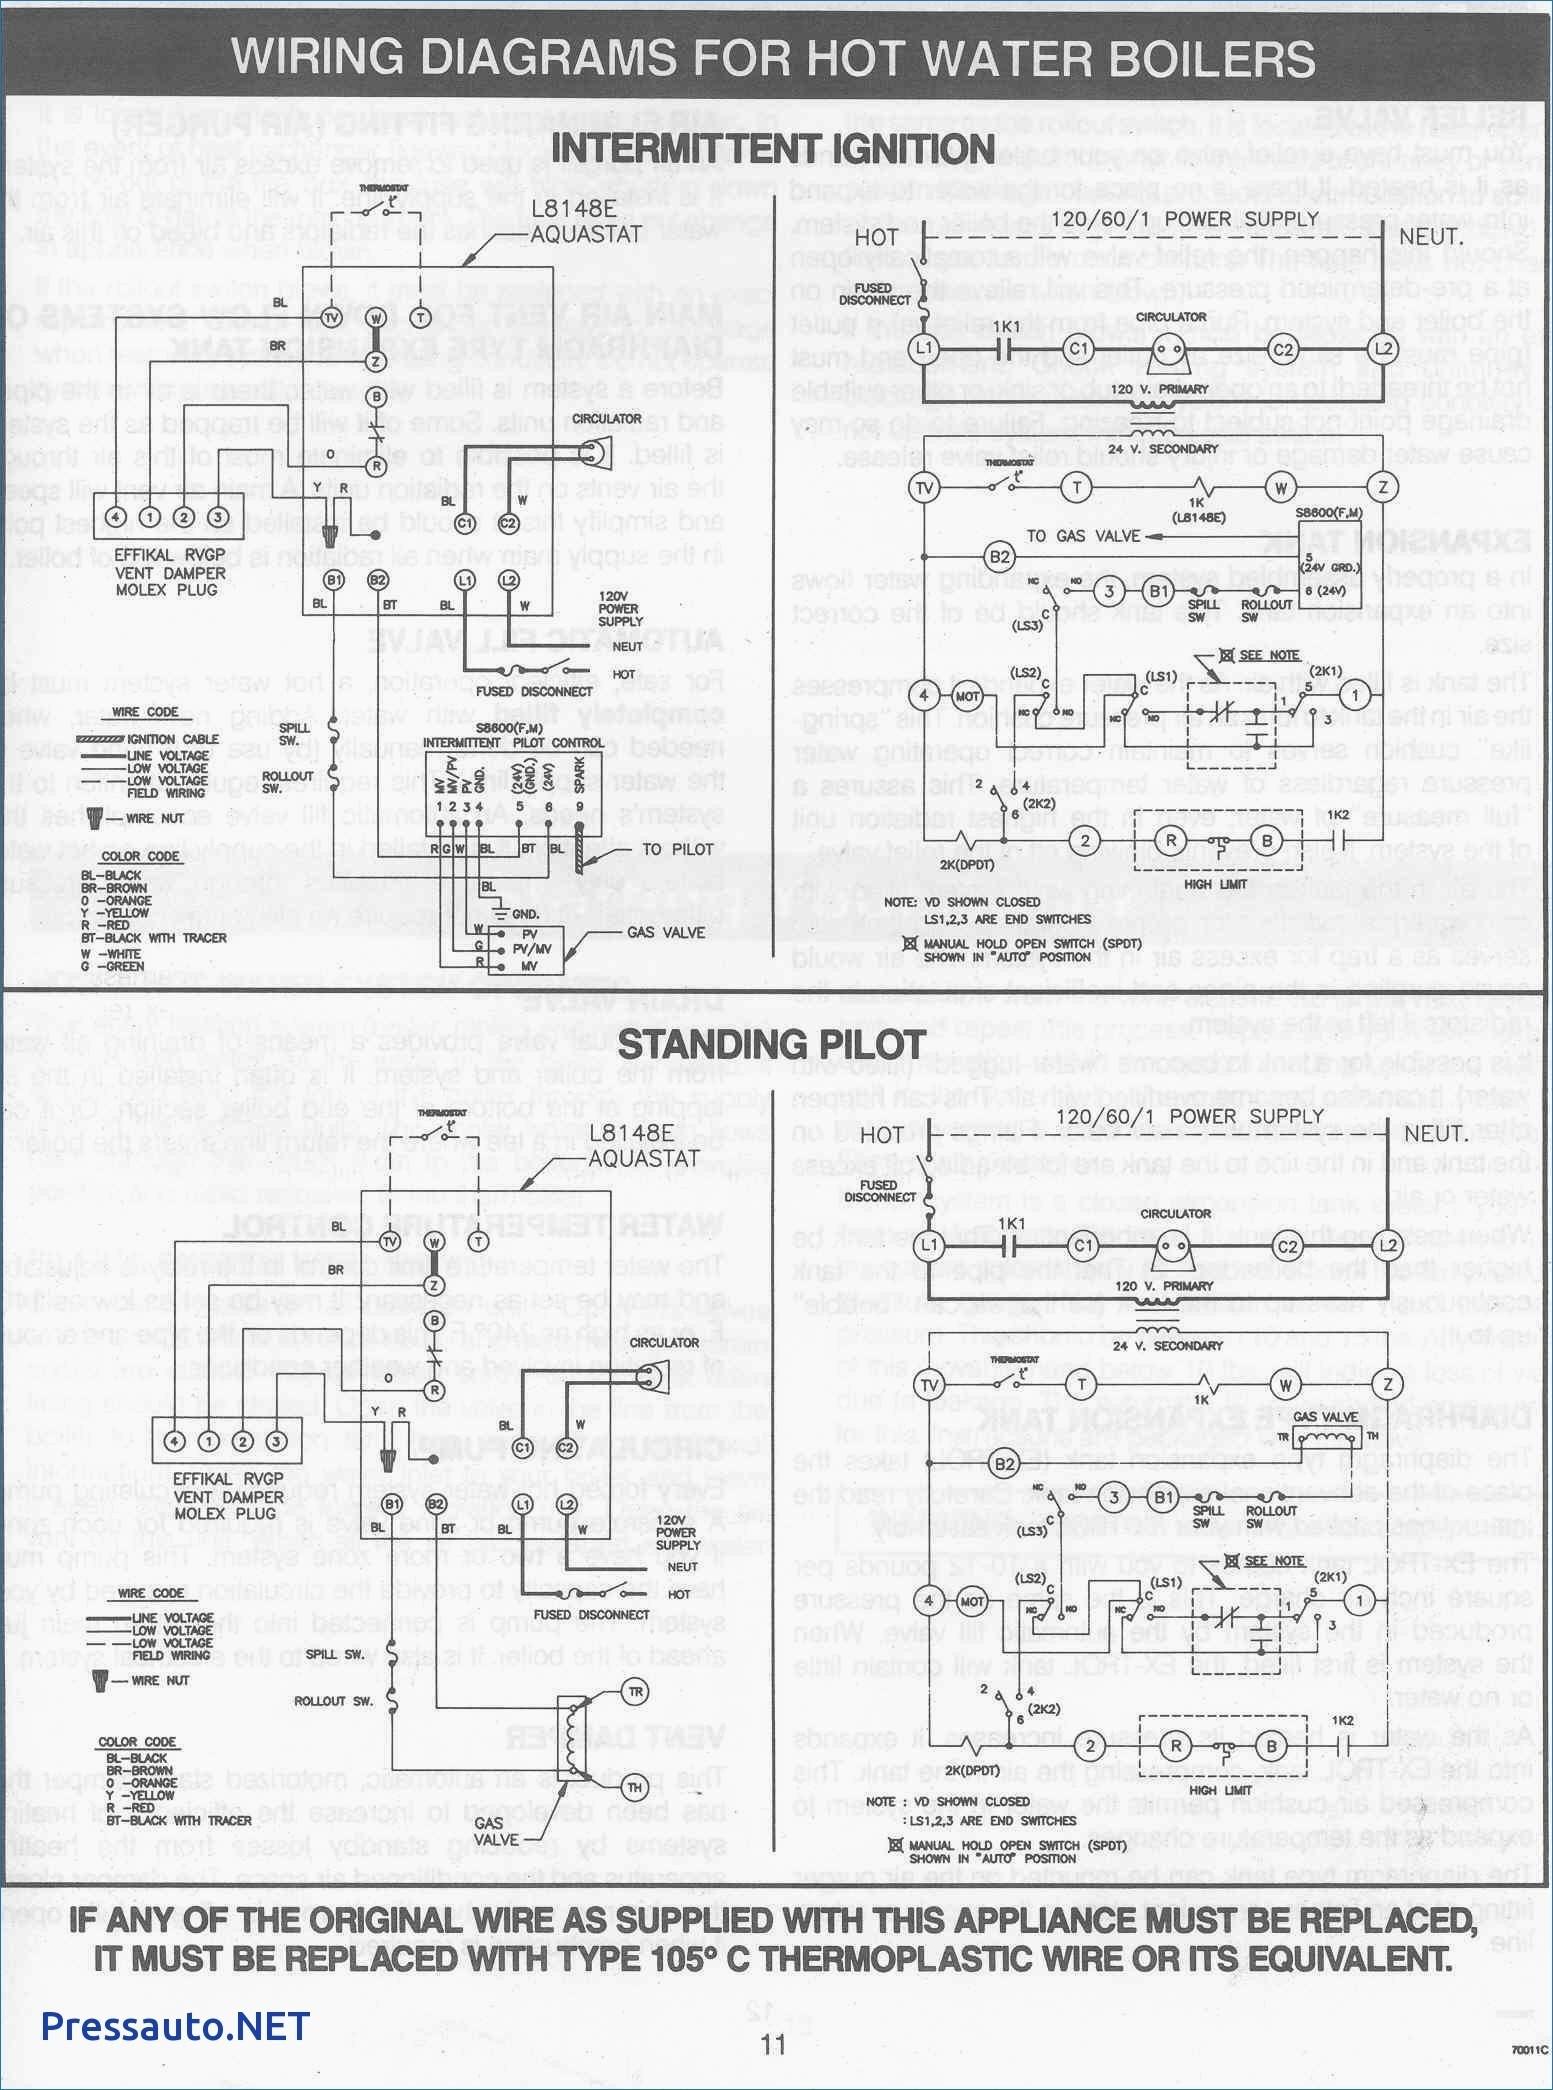 Honeywell L6006C Aquastat Wiring Diagram   Wiring Diagram - Honeywell Aquastat L8148E Wiring Diagram